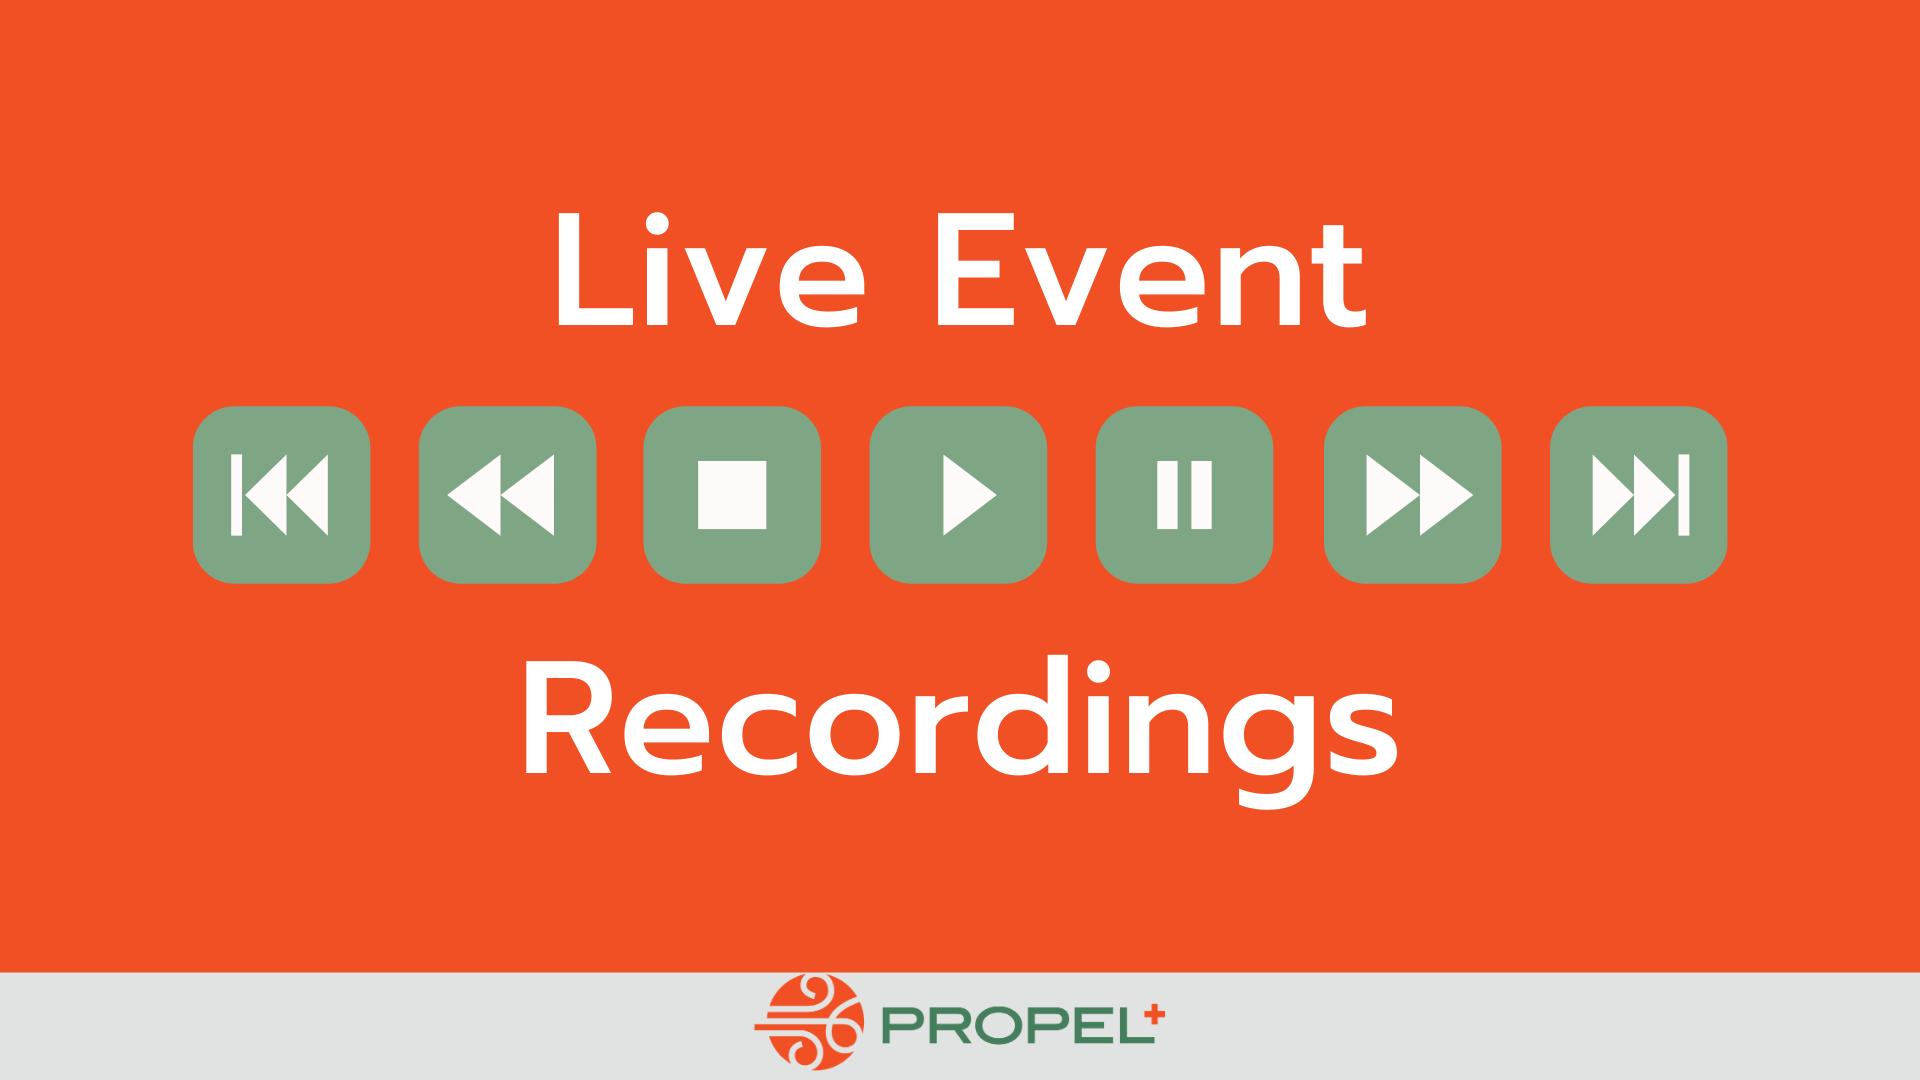 Live Event Recordings